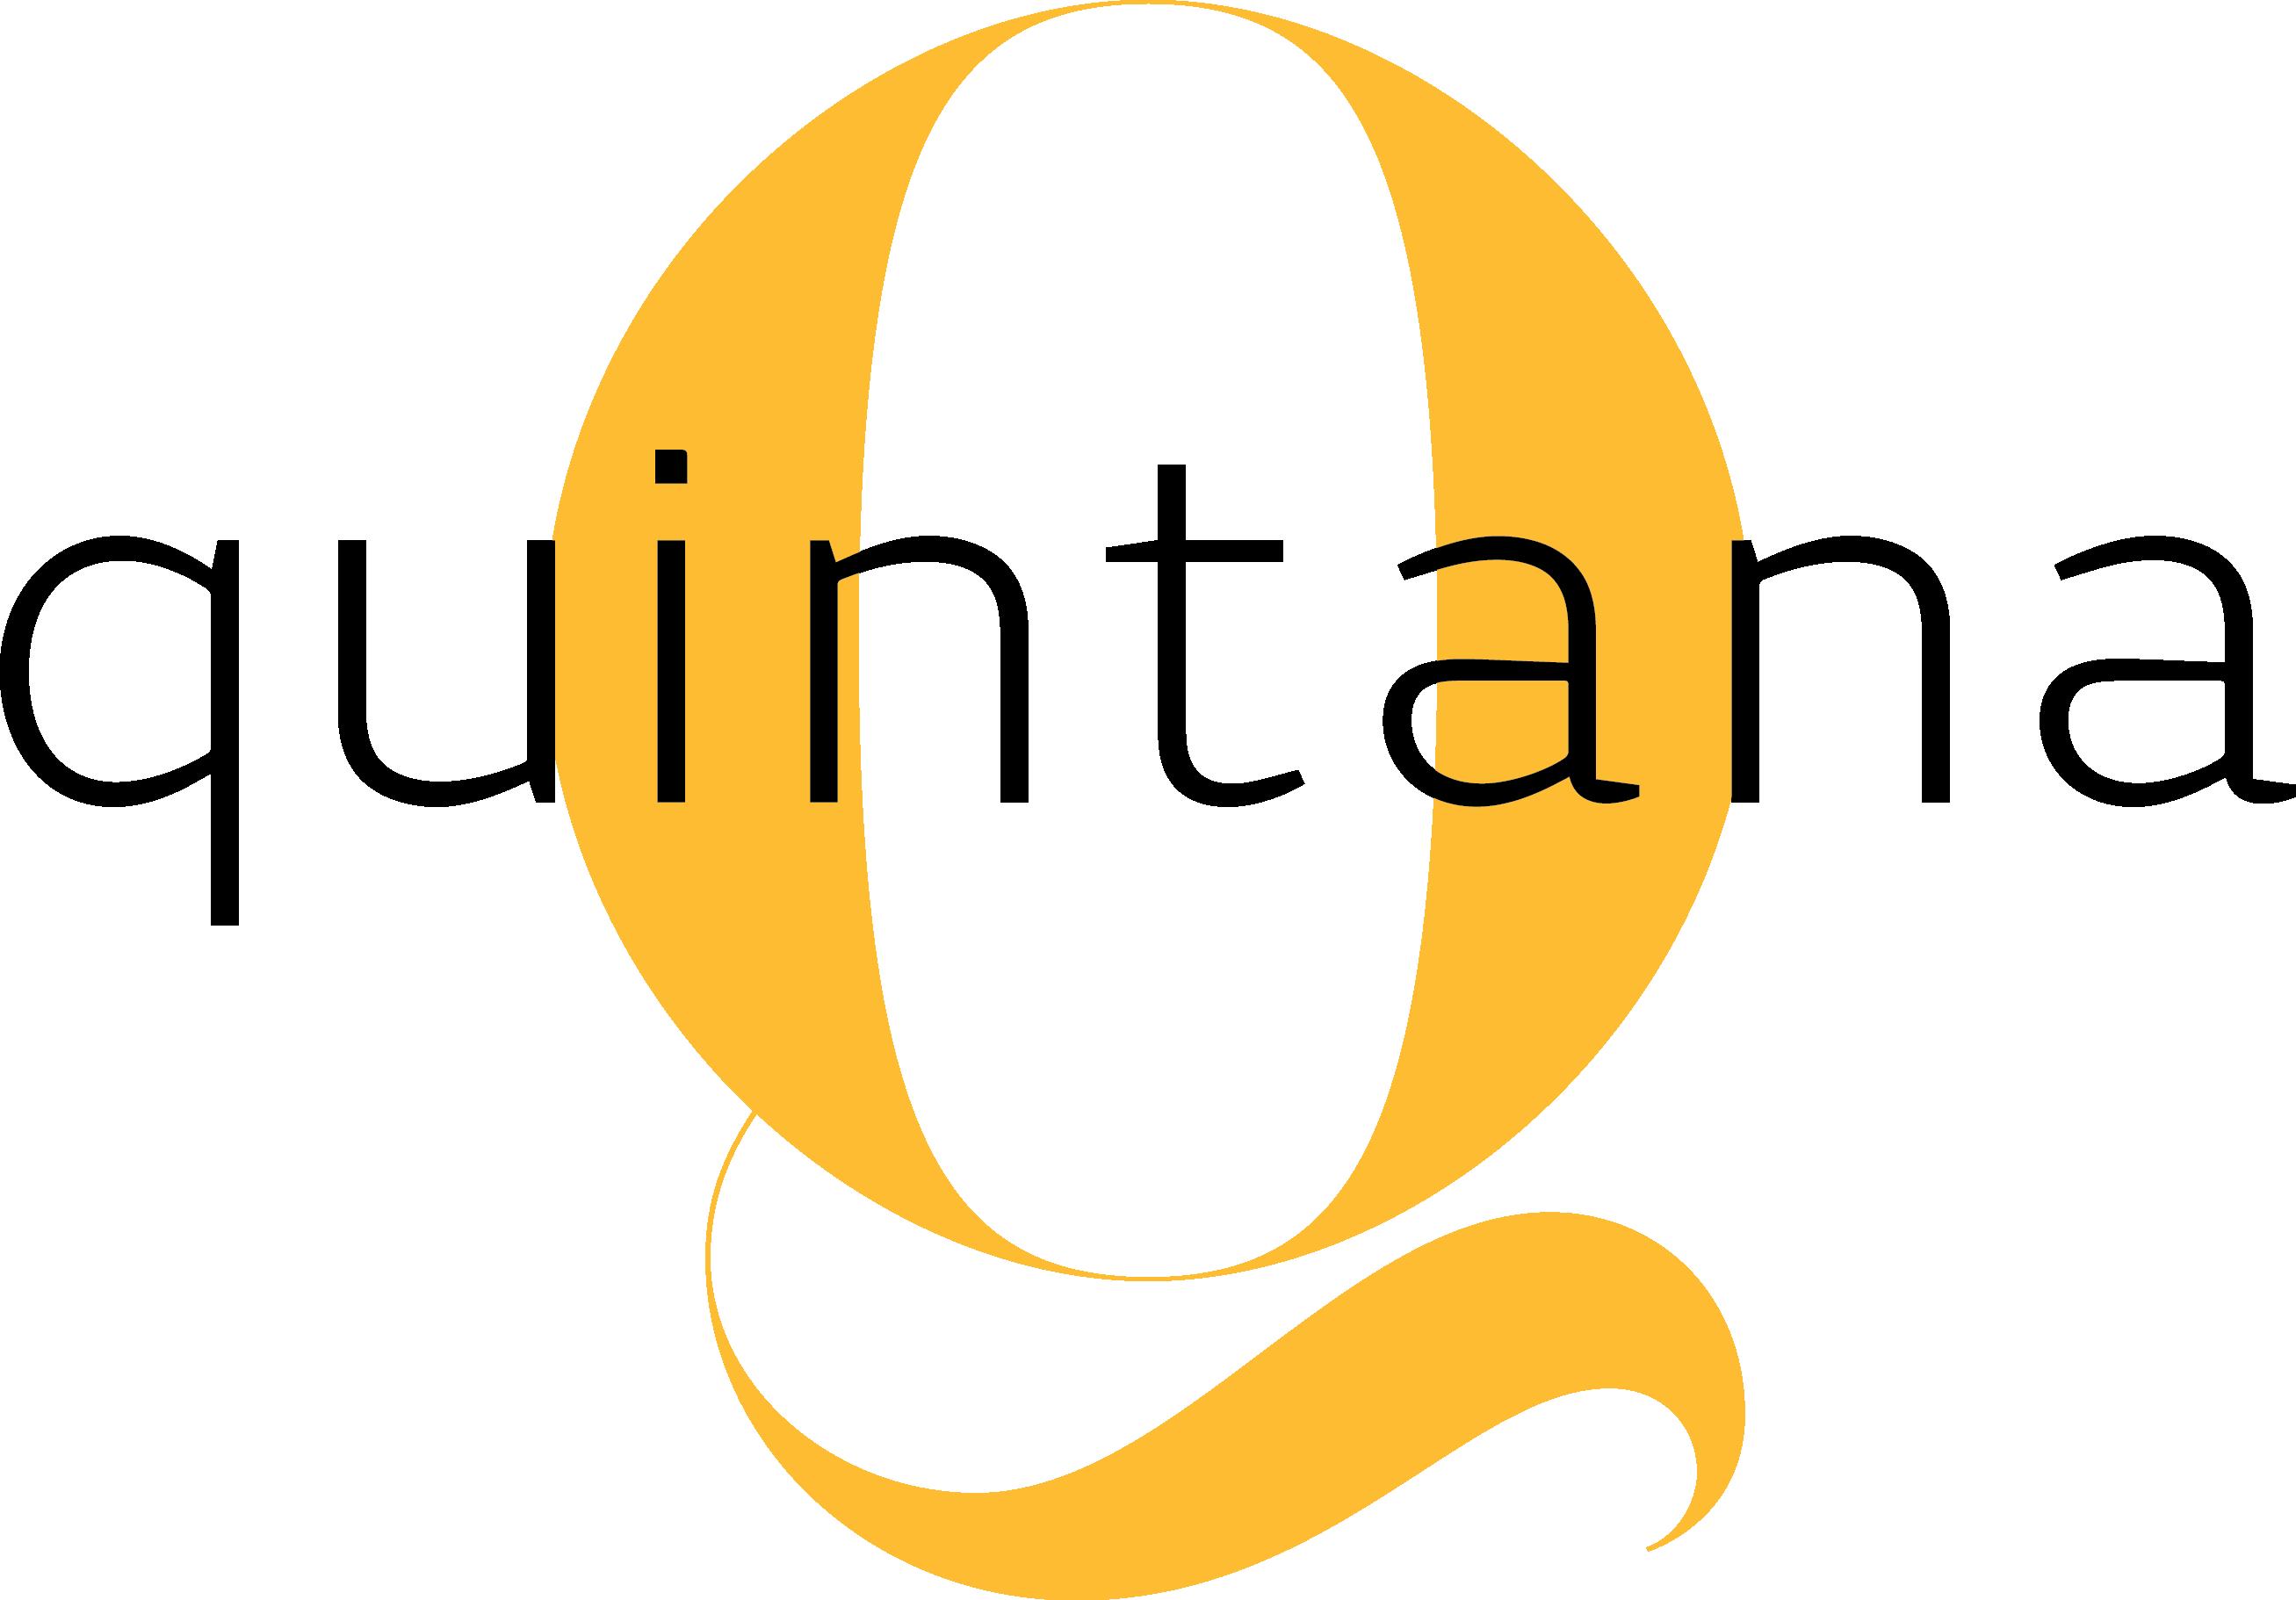 Quintana Creative